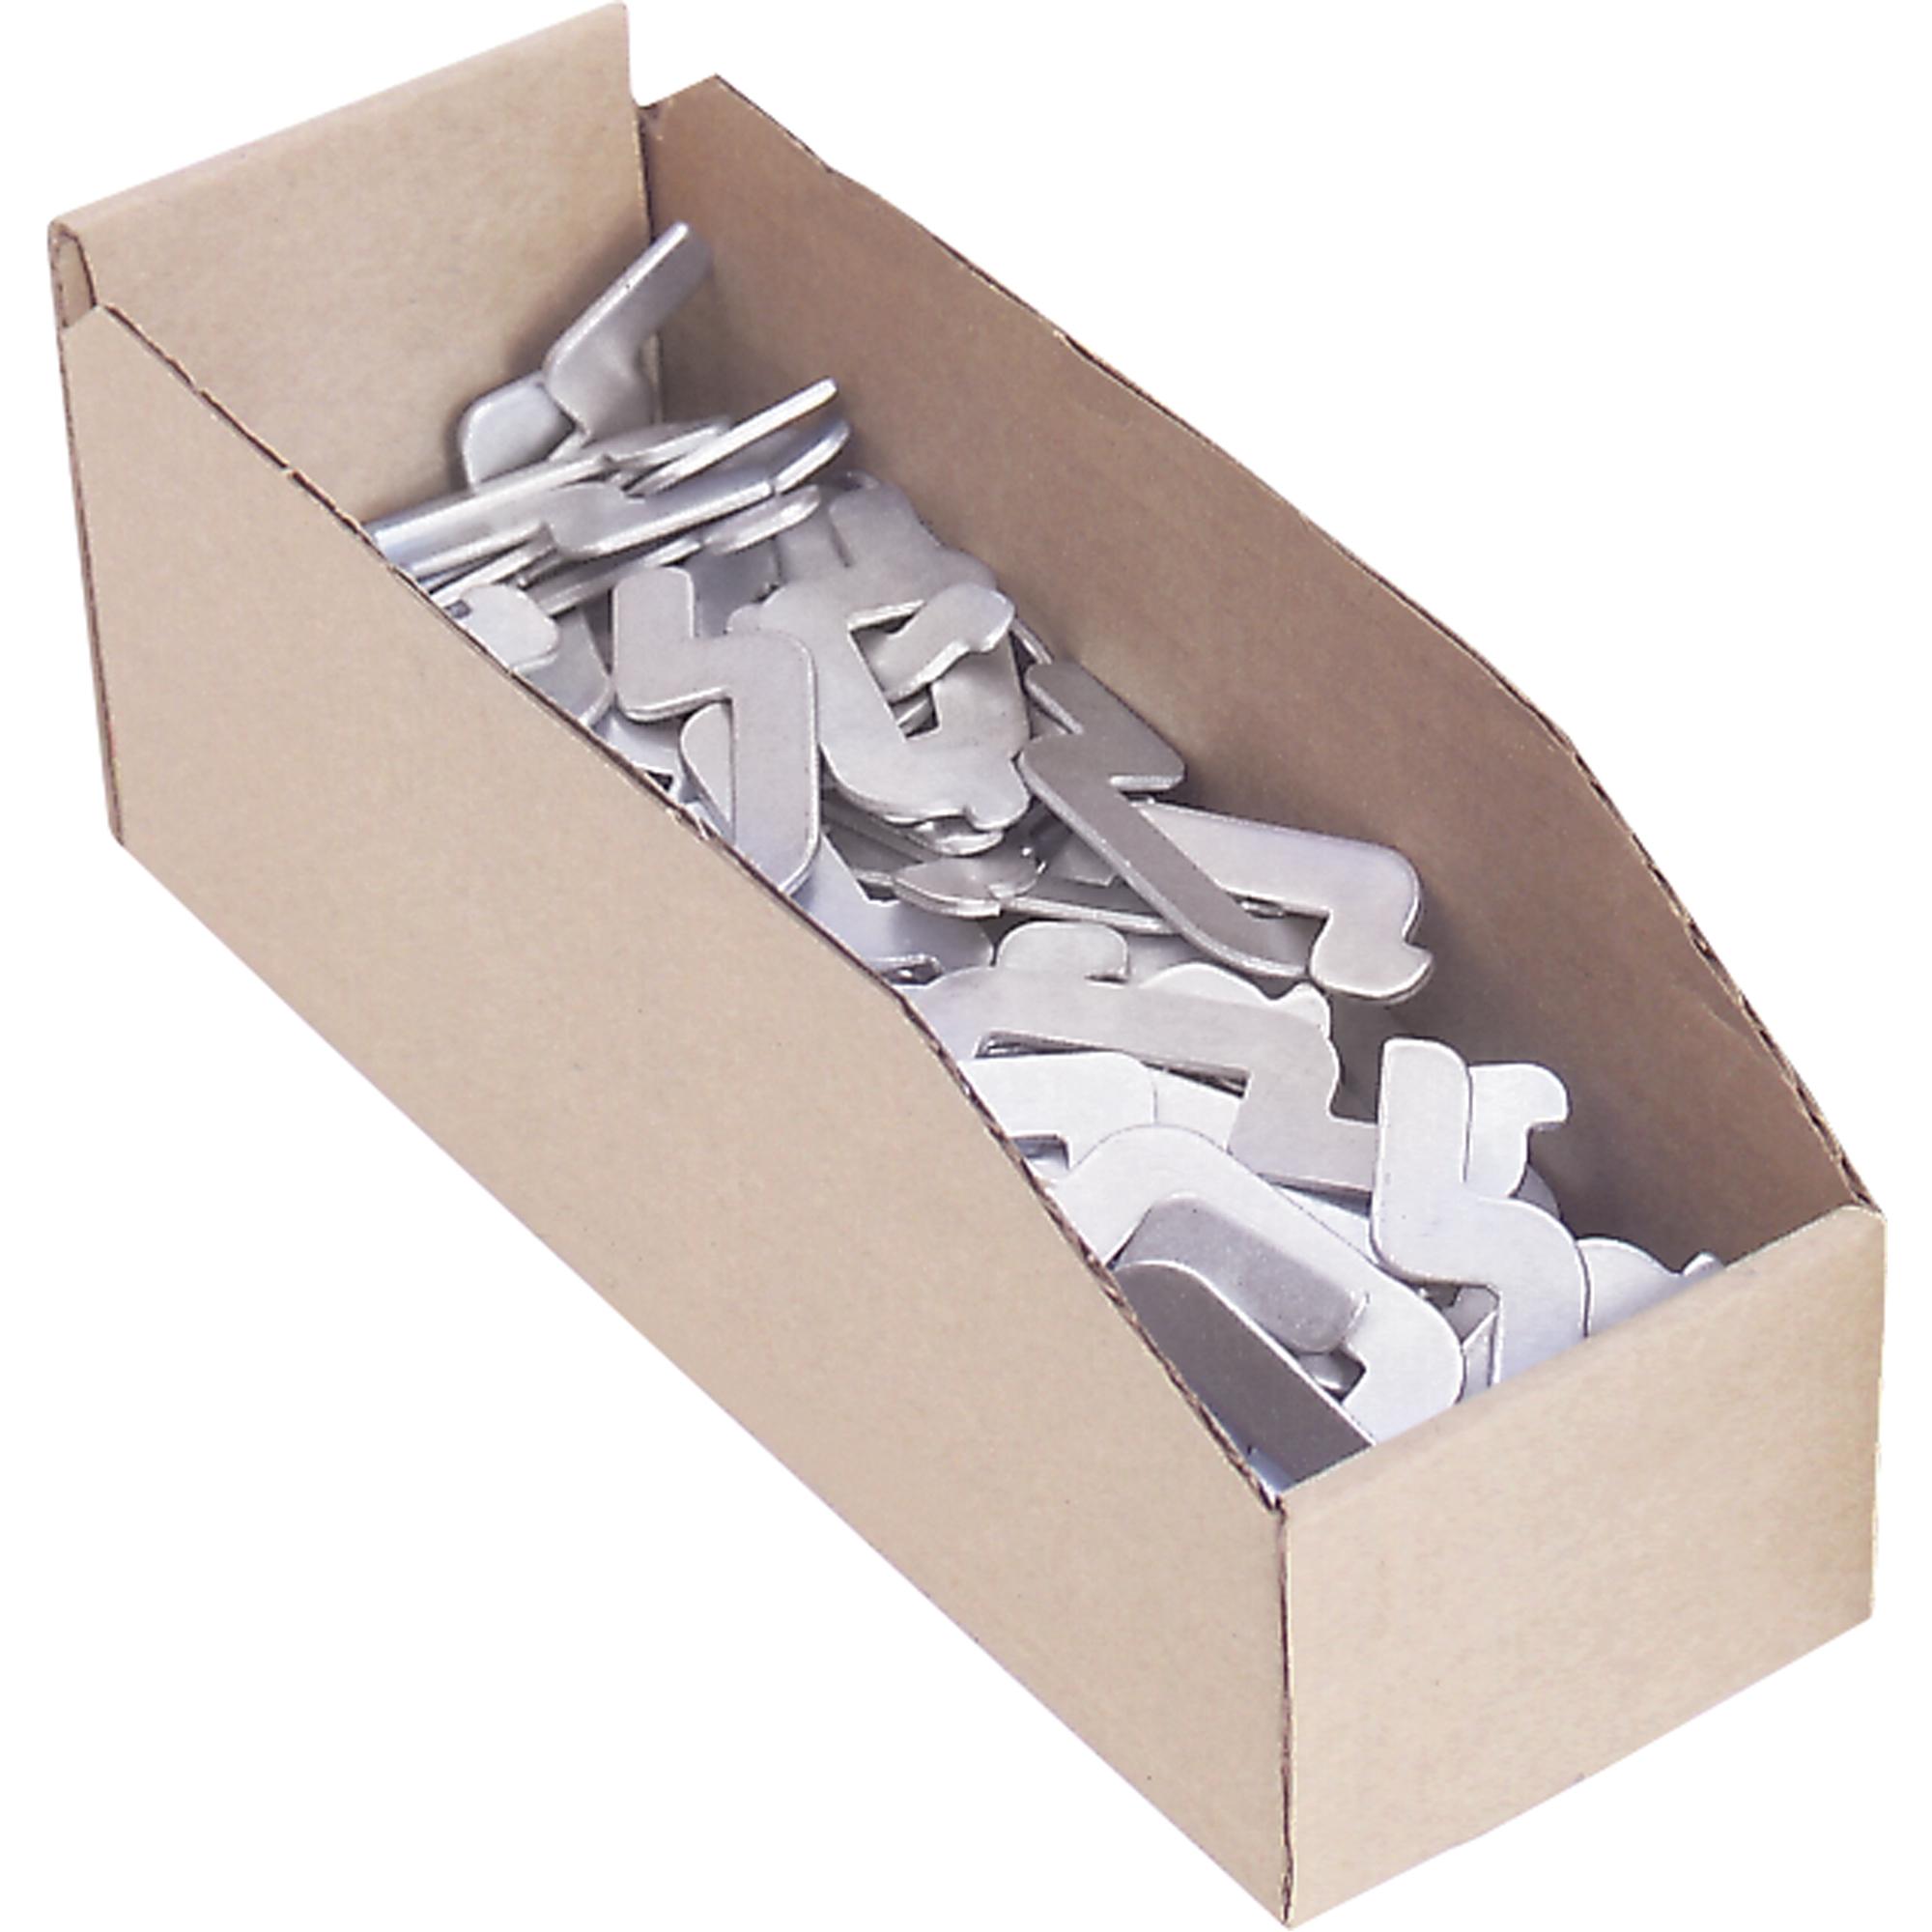 "Cardinal Boxes 12"" Deep Corrugated Parts Bins, 8"" W x 12"" D x 4-1/2"" H, Beige"